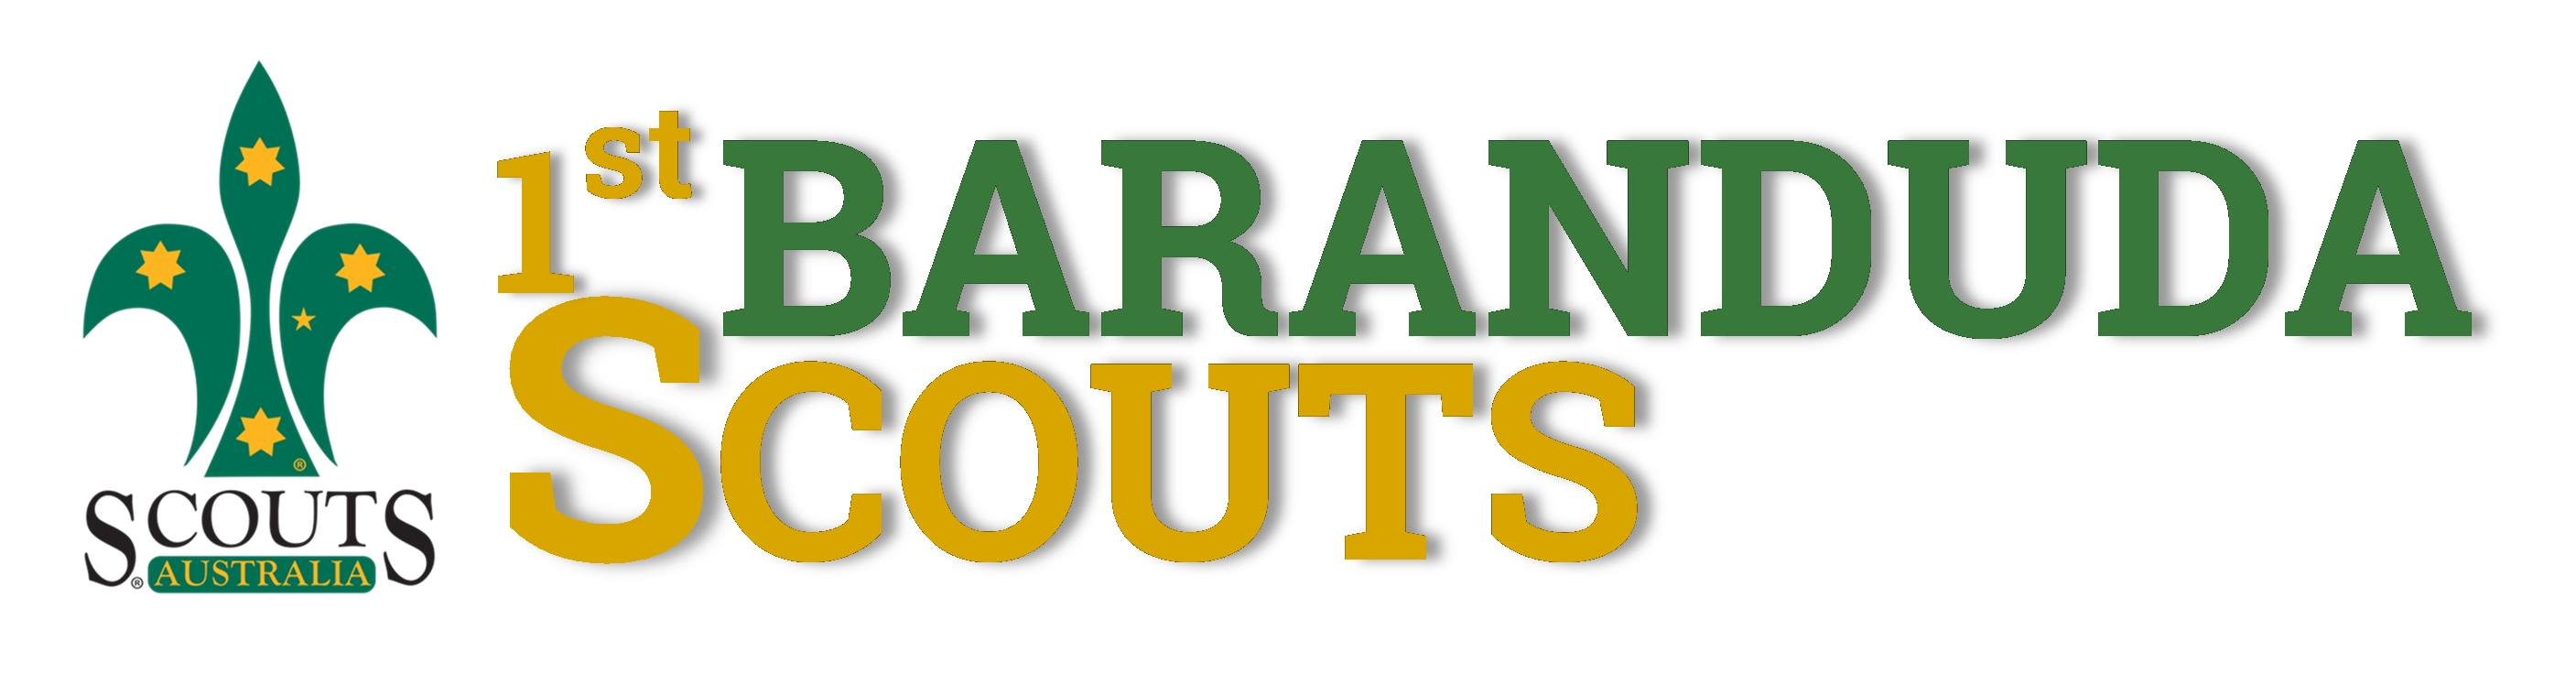 Baranduda Scouts